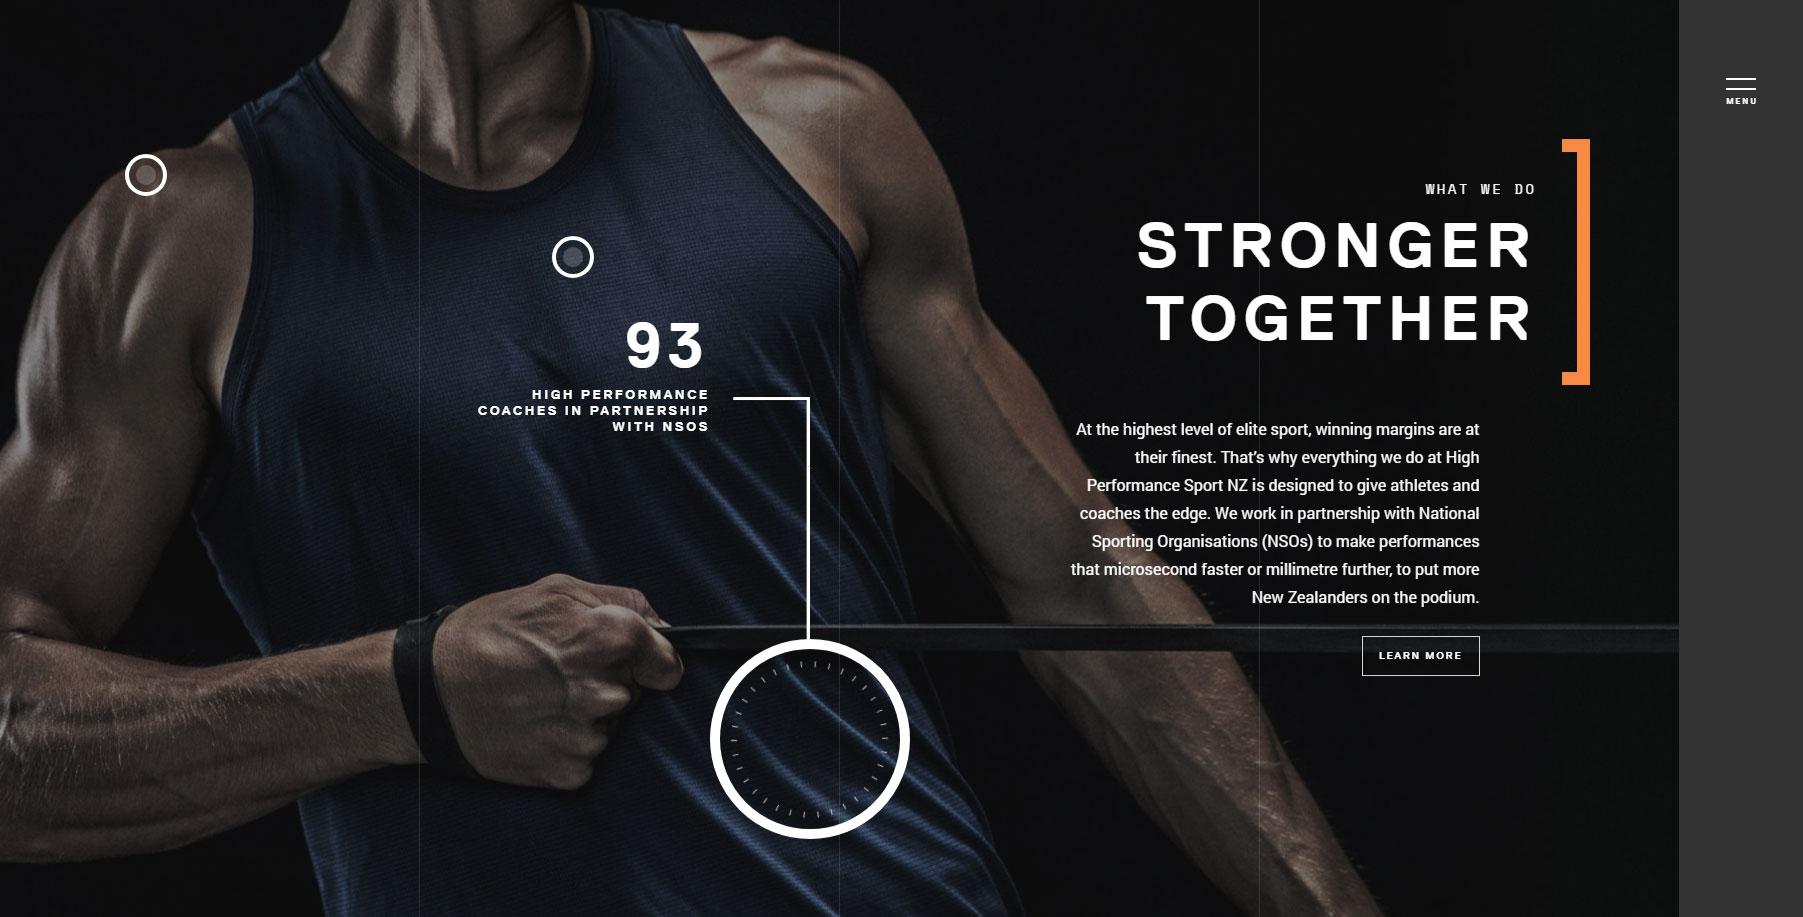 High Performance Sport NZ - Website of the Day